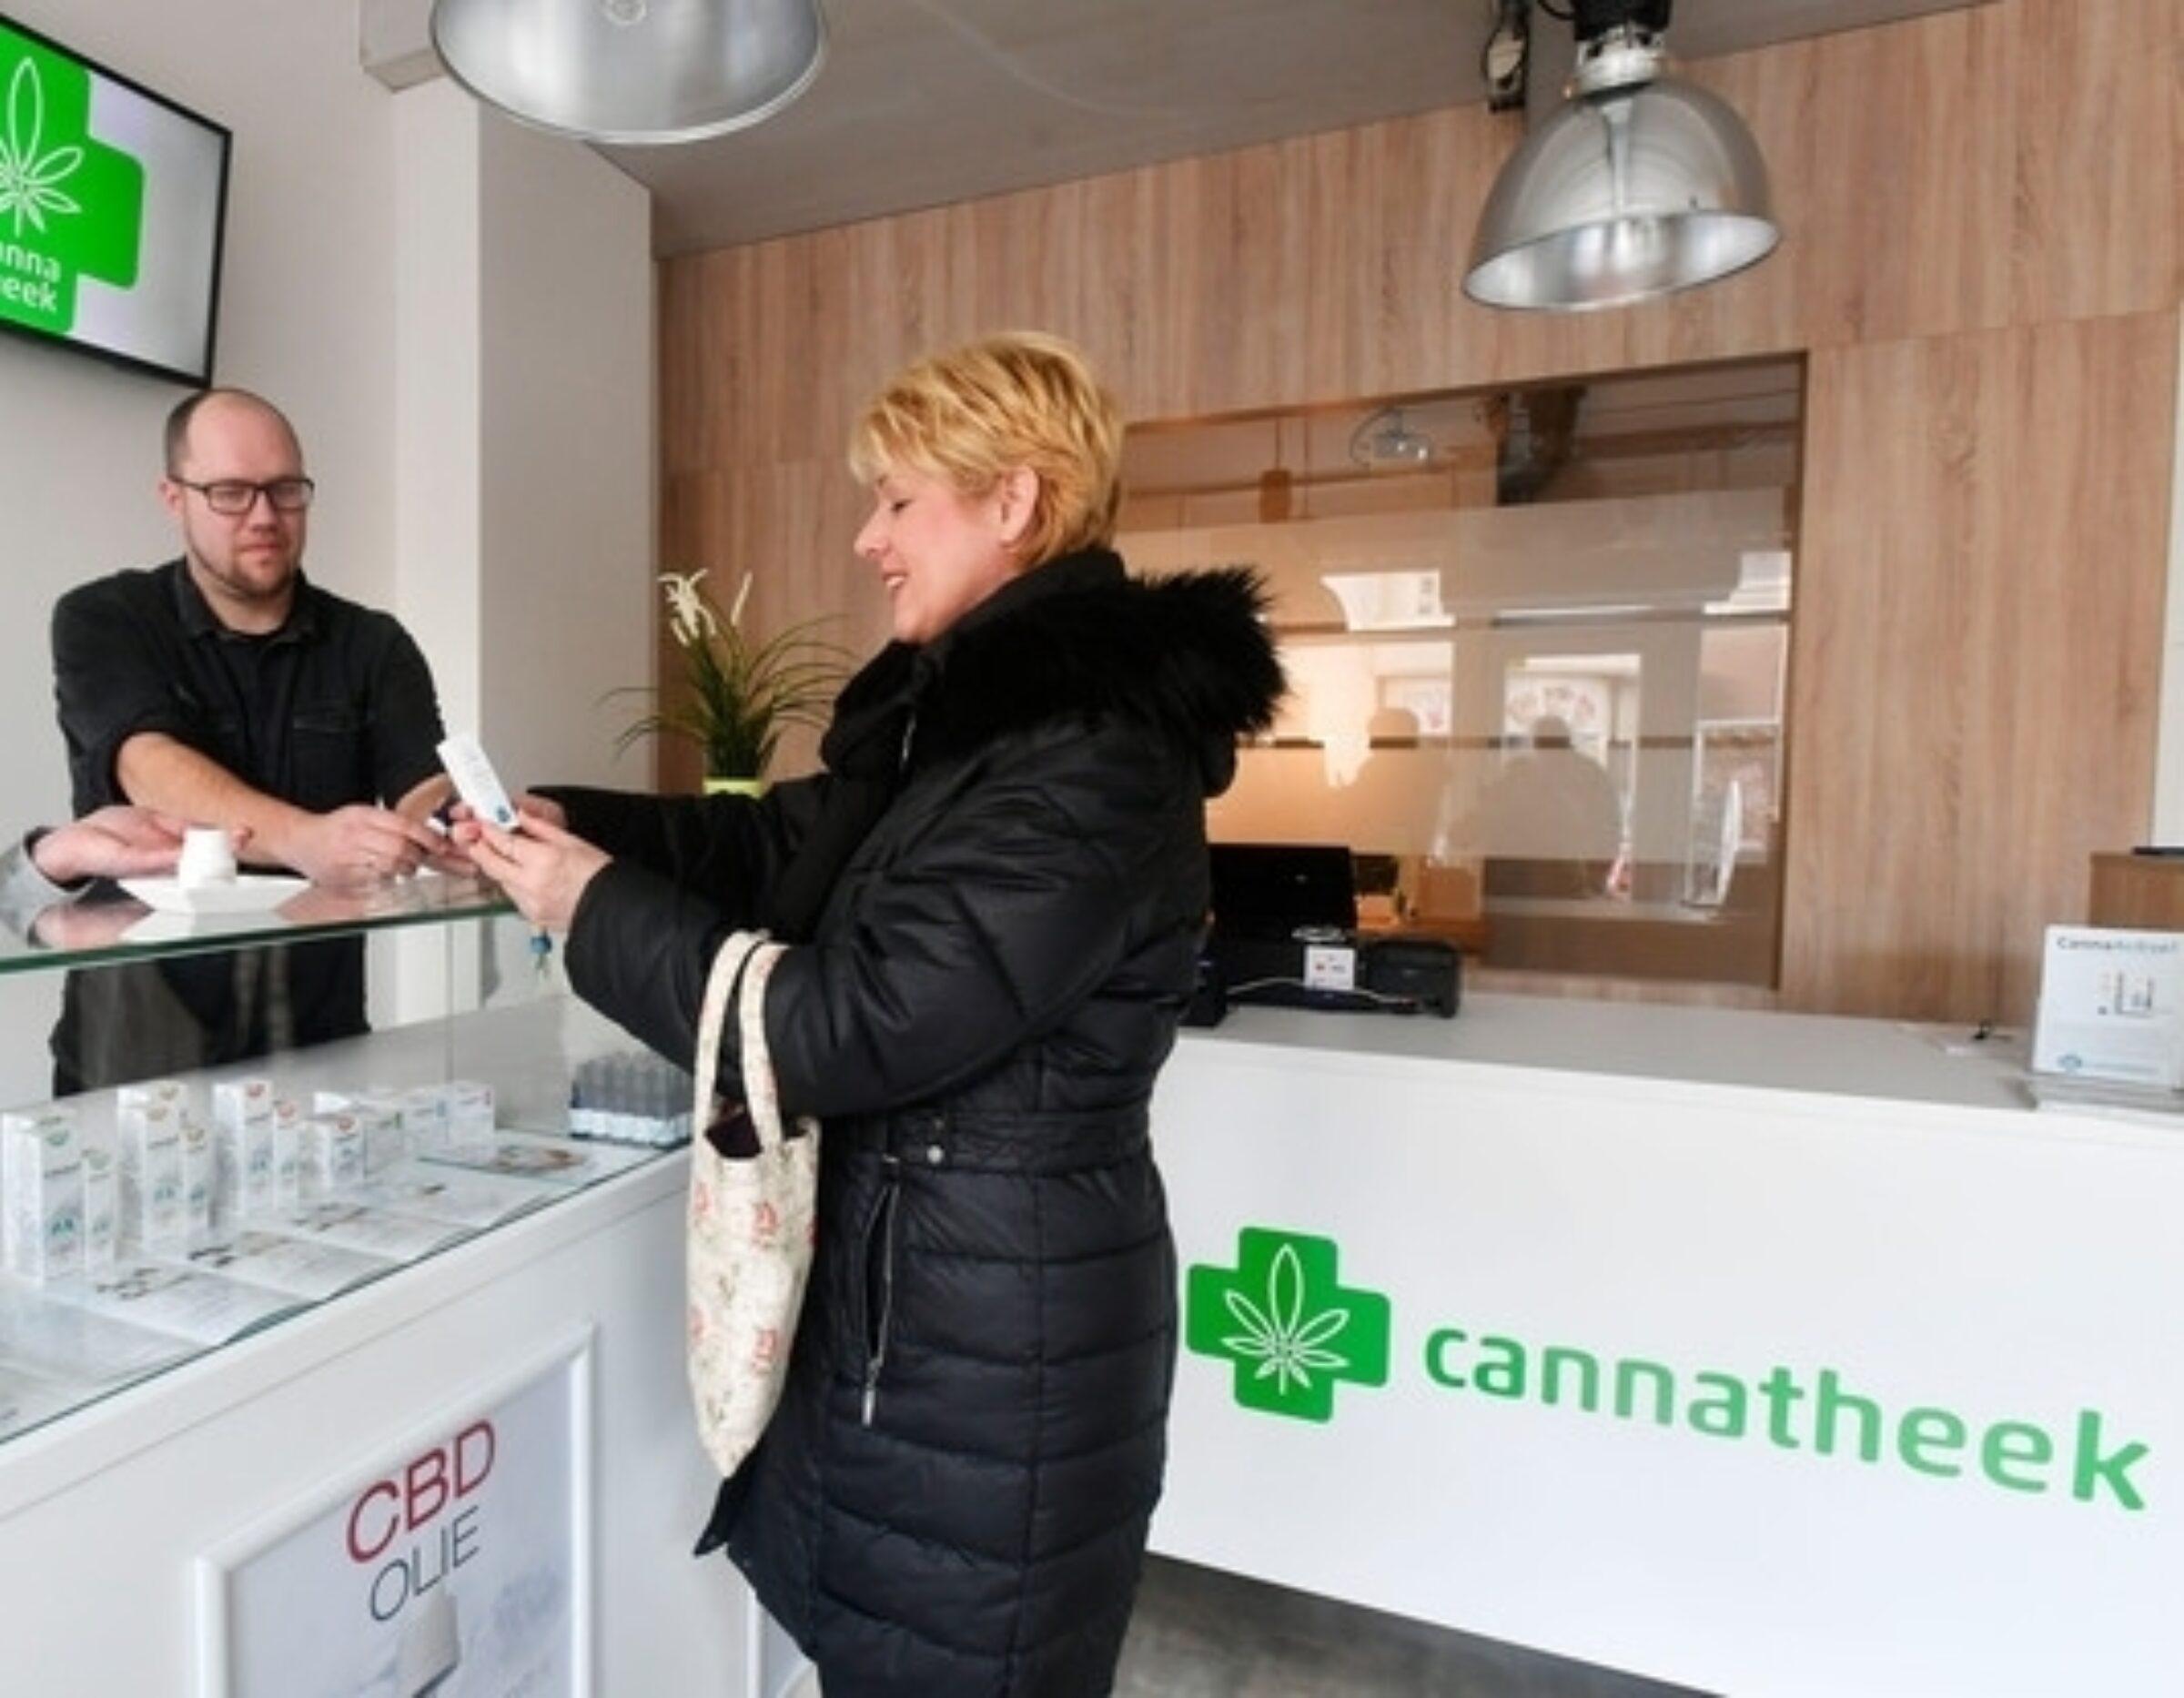 Cannatheek Enschede